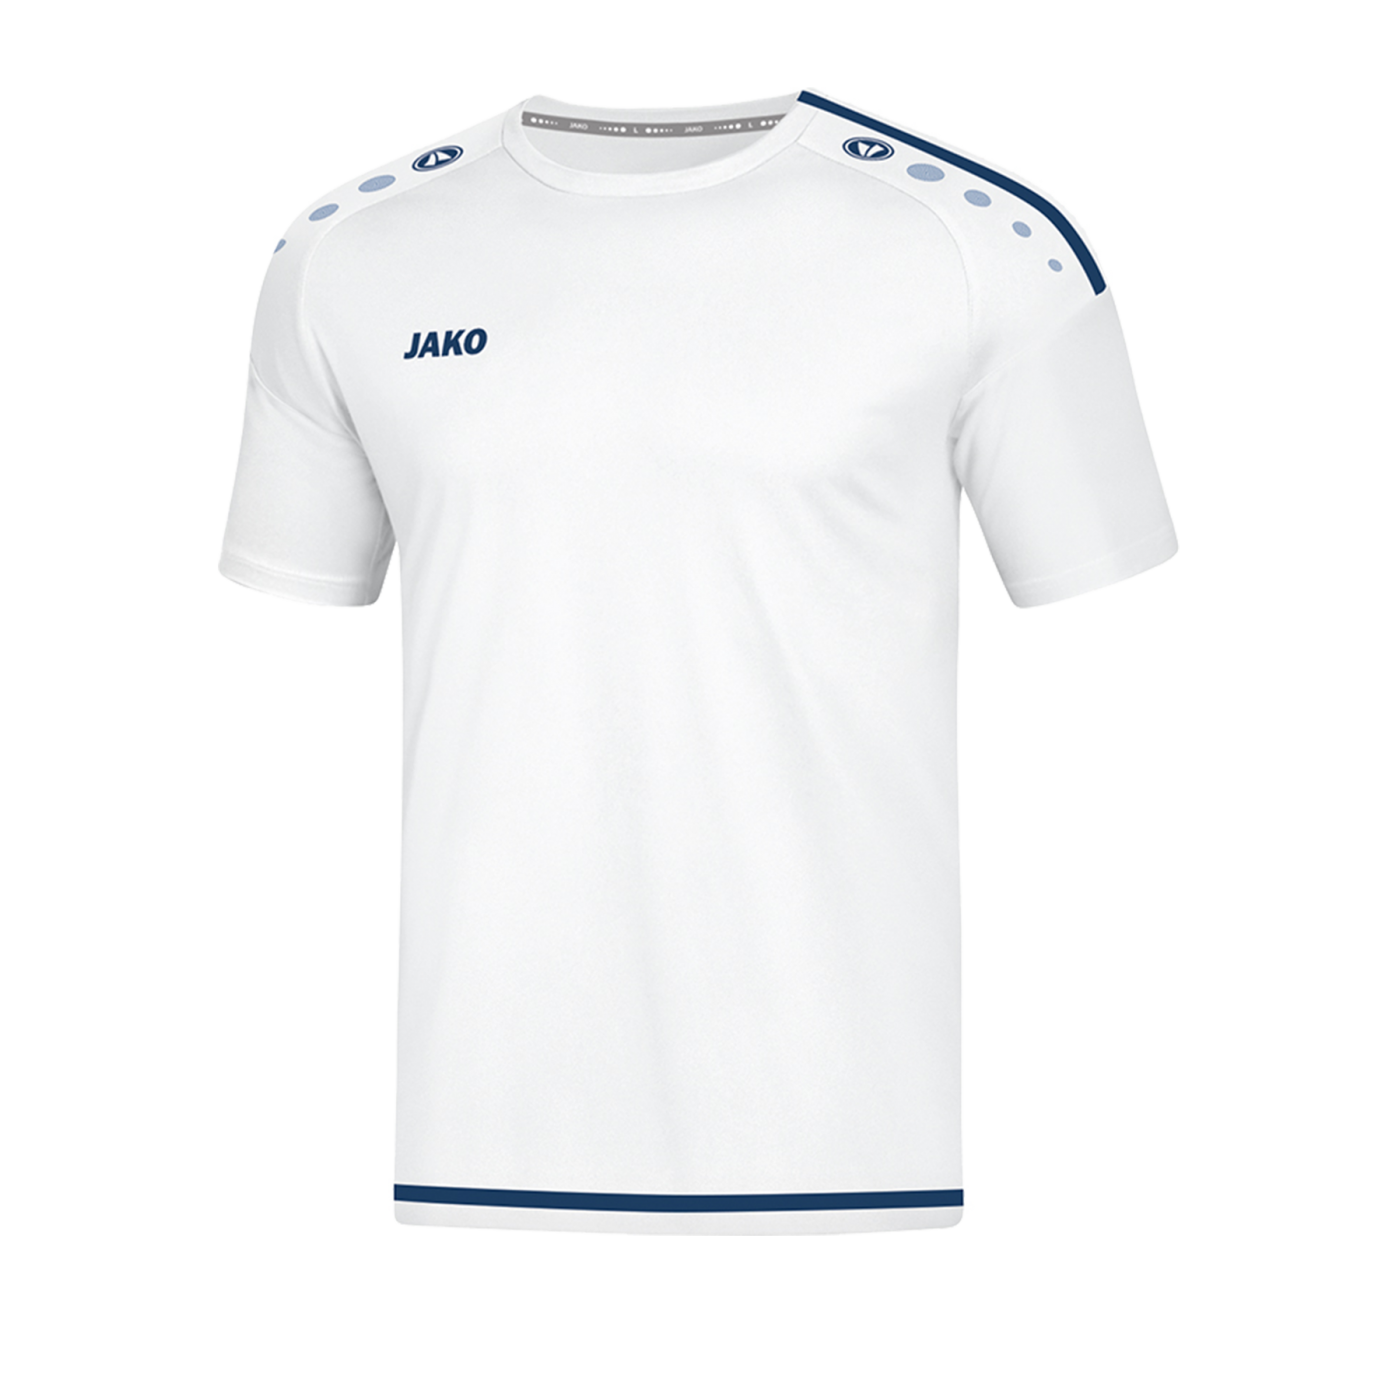 Jako Striker 2.0 Trikot kurzarm Weiss Blau F90 - Weiss